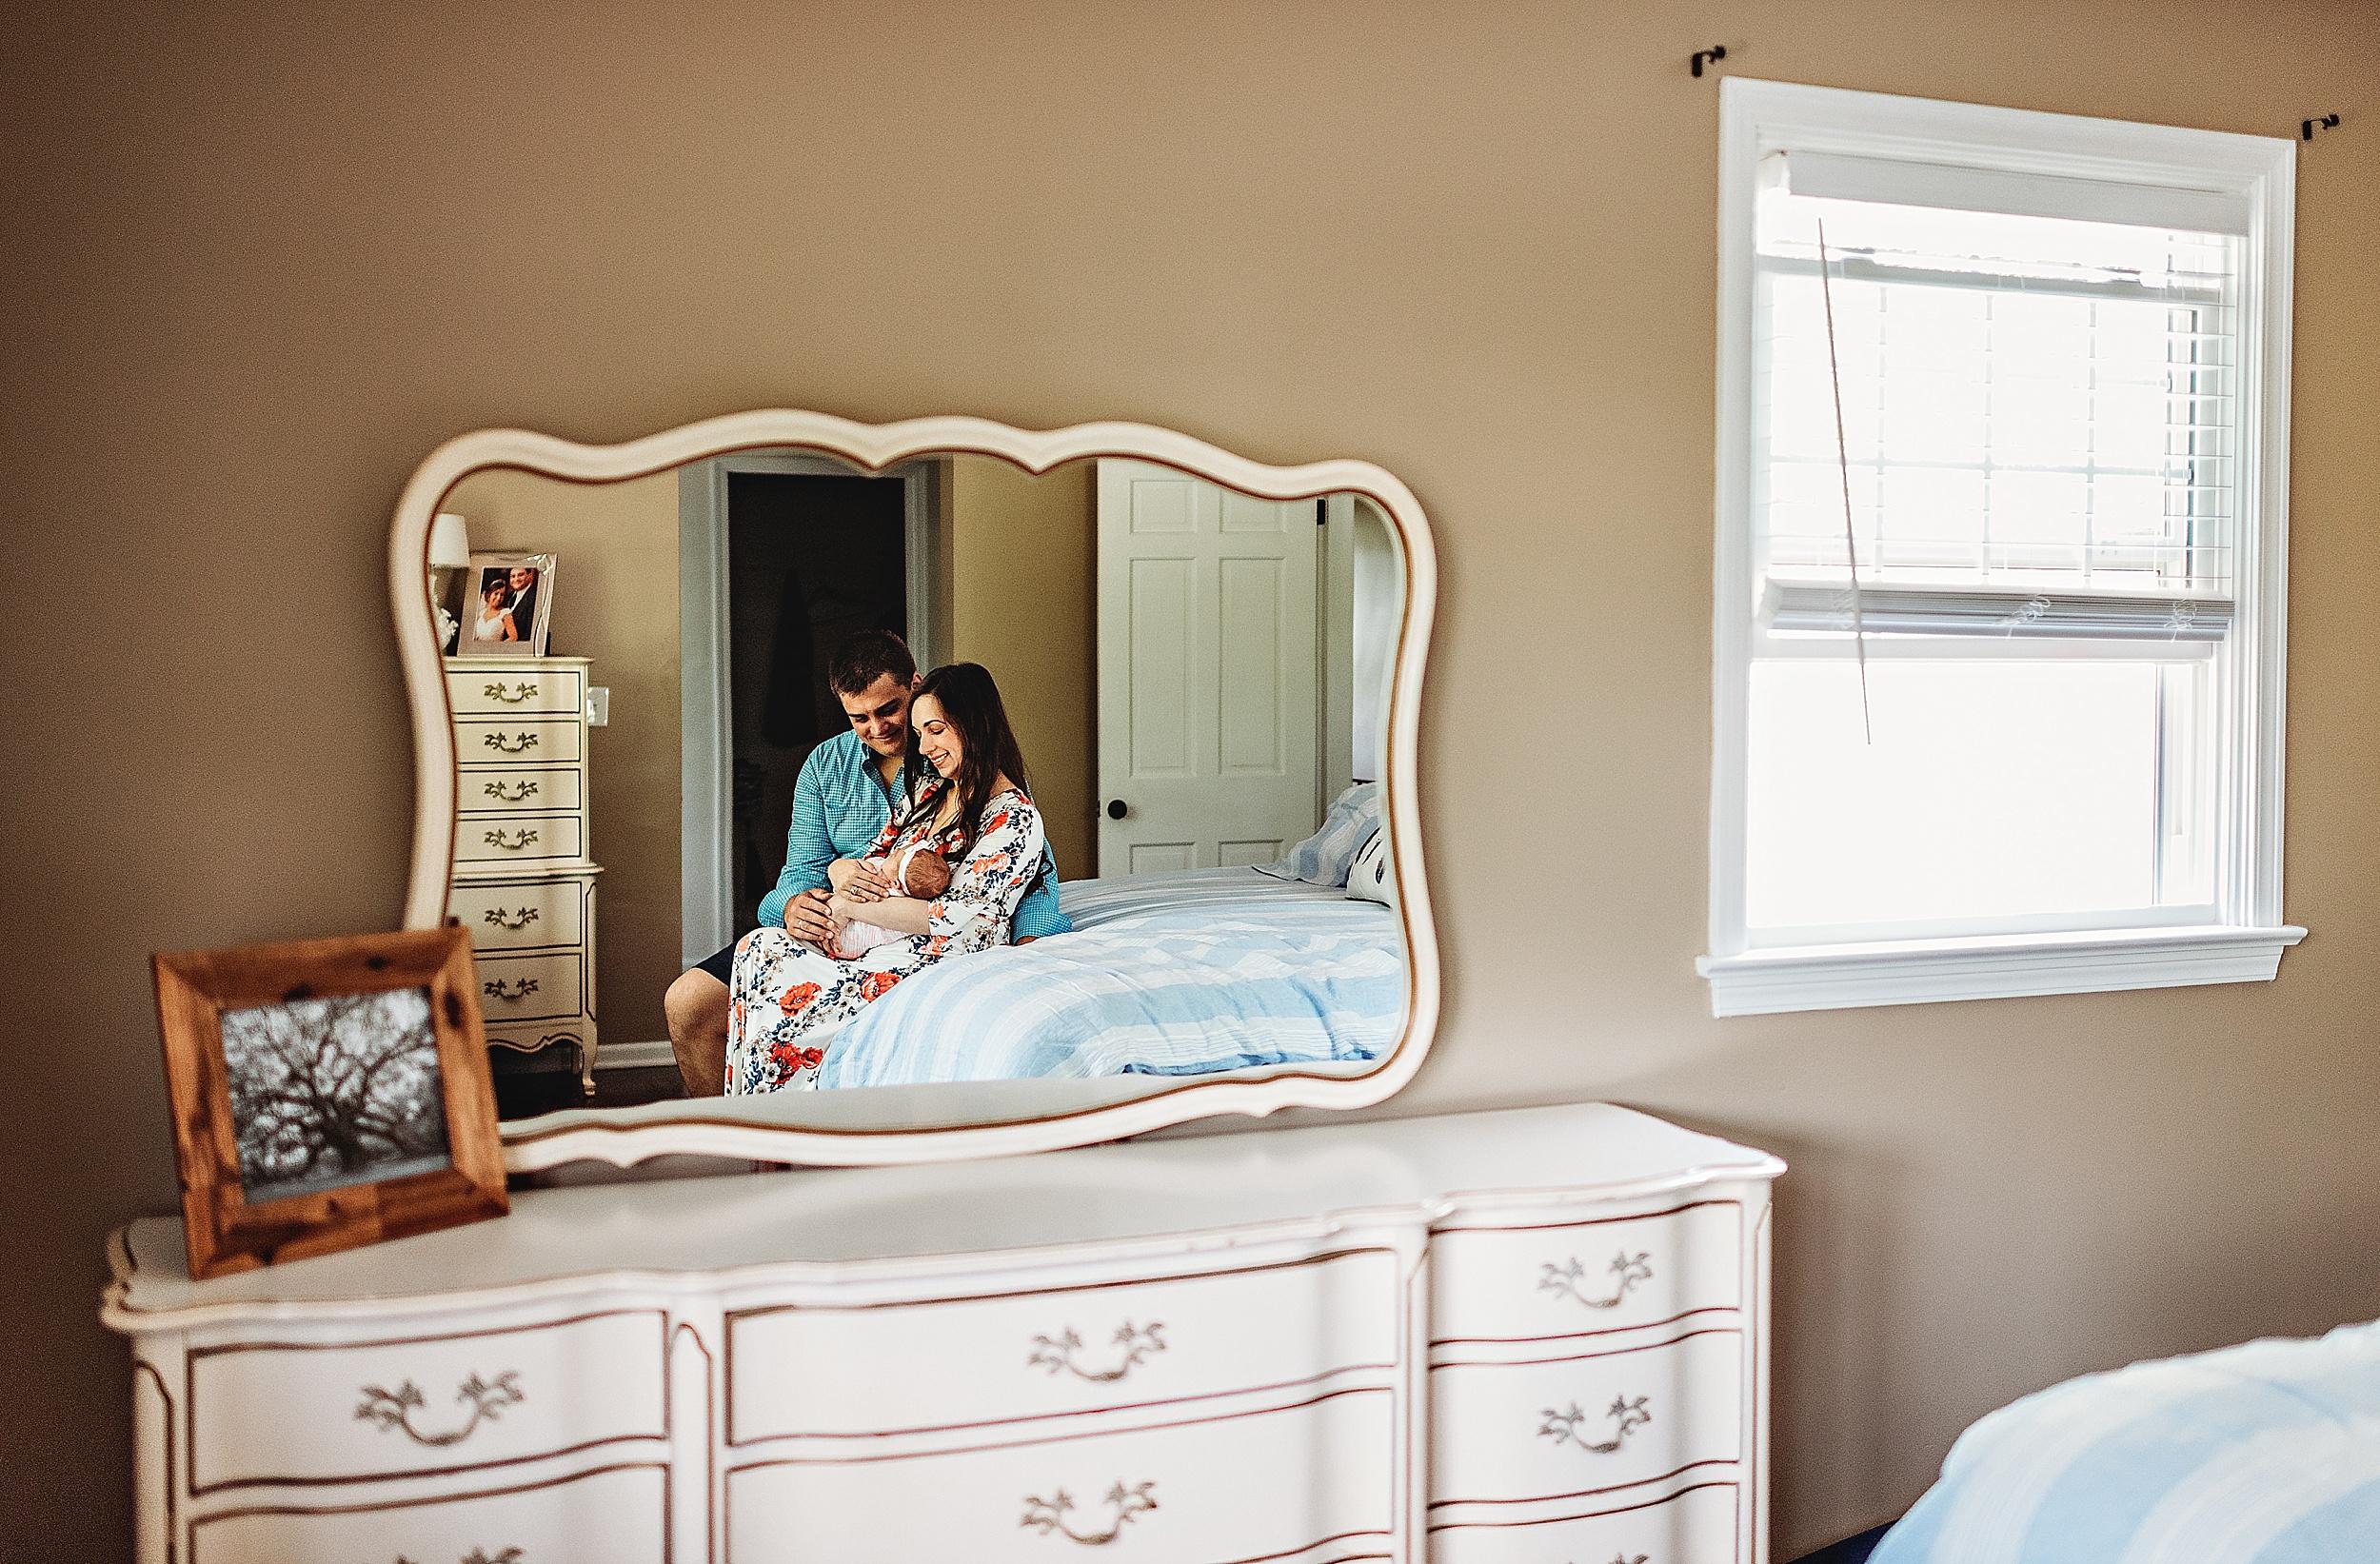 lauren-grayson-photography-akron-cleveland-ohio-photographer-family-newborn-home-photo-session-grace-a_0296.jpg